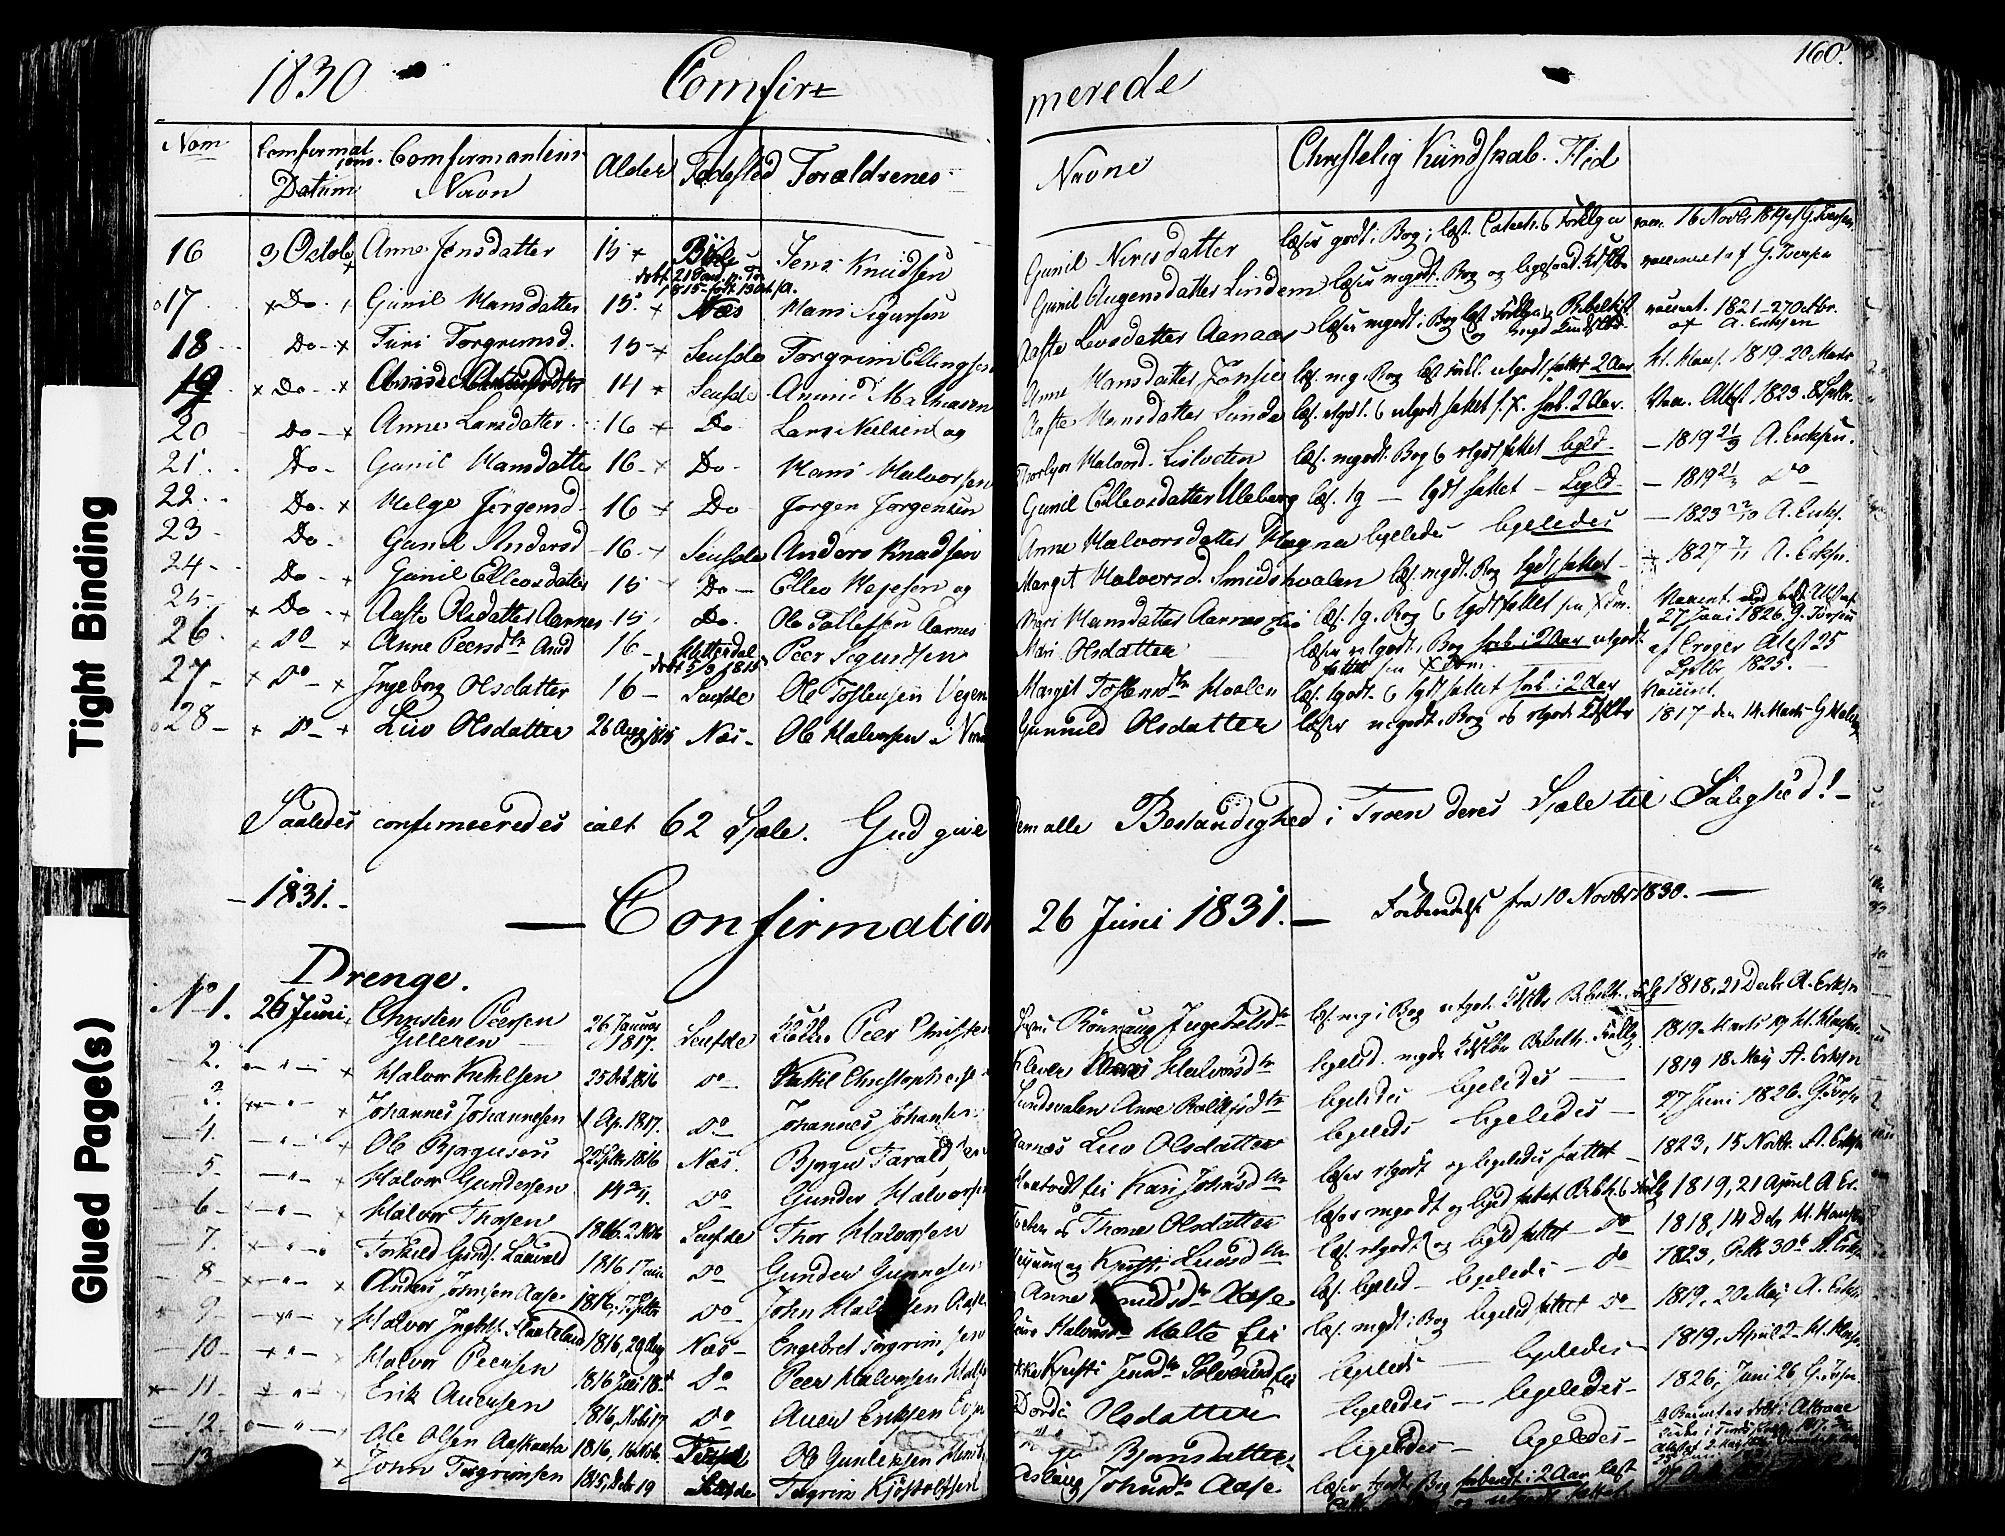 SAKO, Sauherad kirkebøker, F/Fa/L0006: Ministerialbok nr. I 6, 1827-1850, s. 160